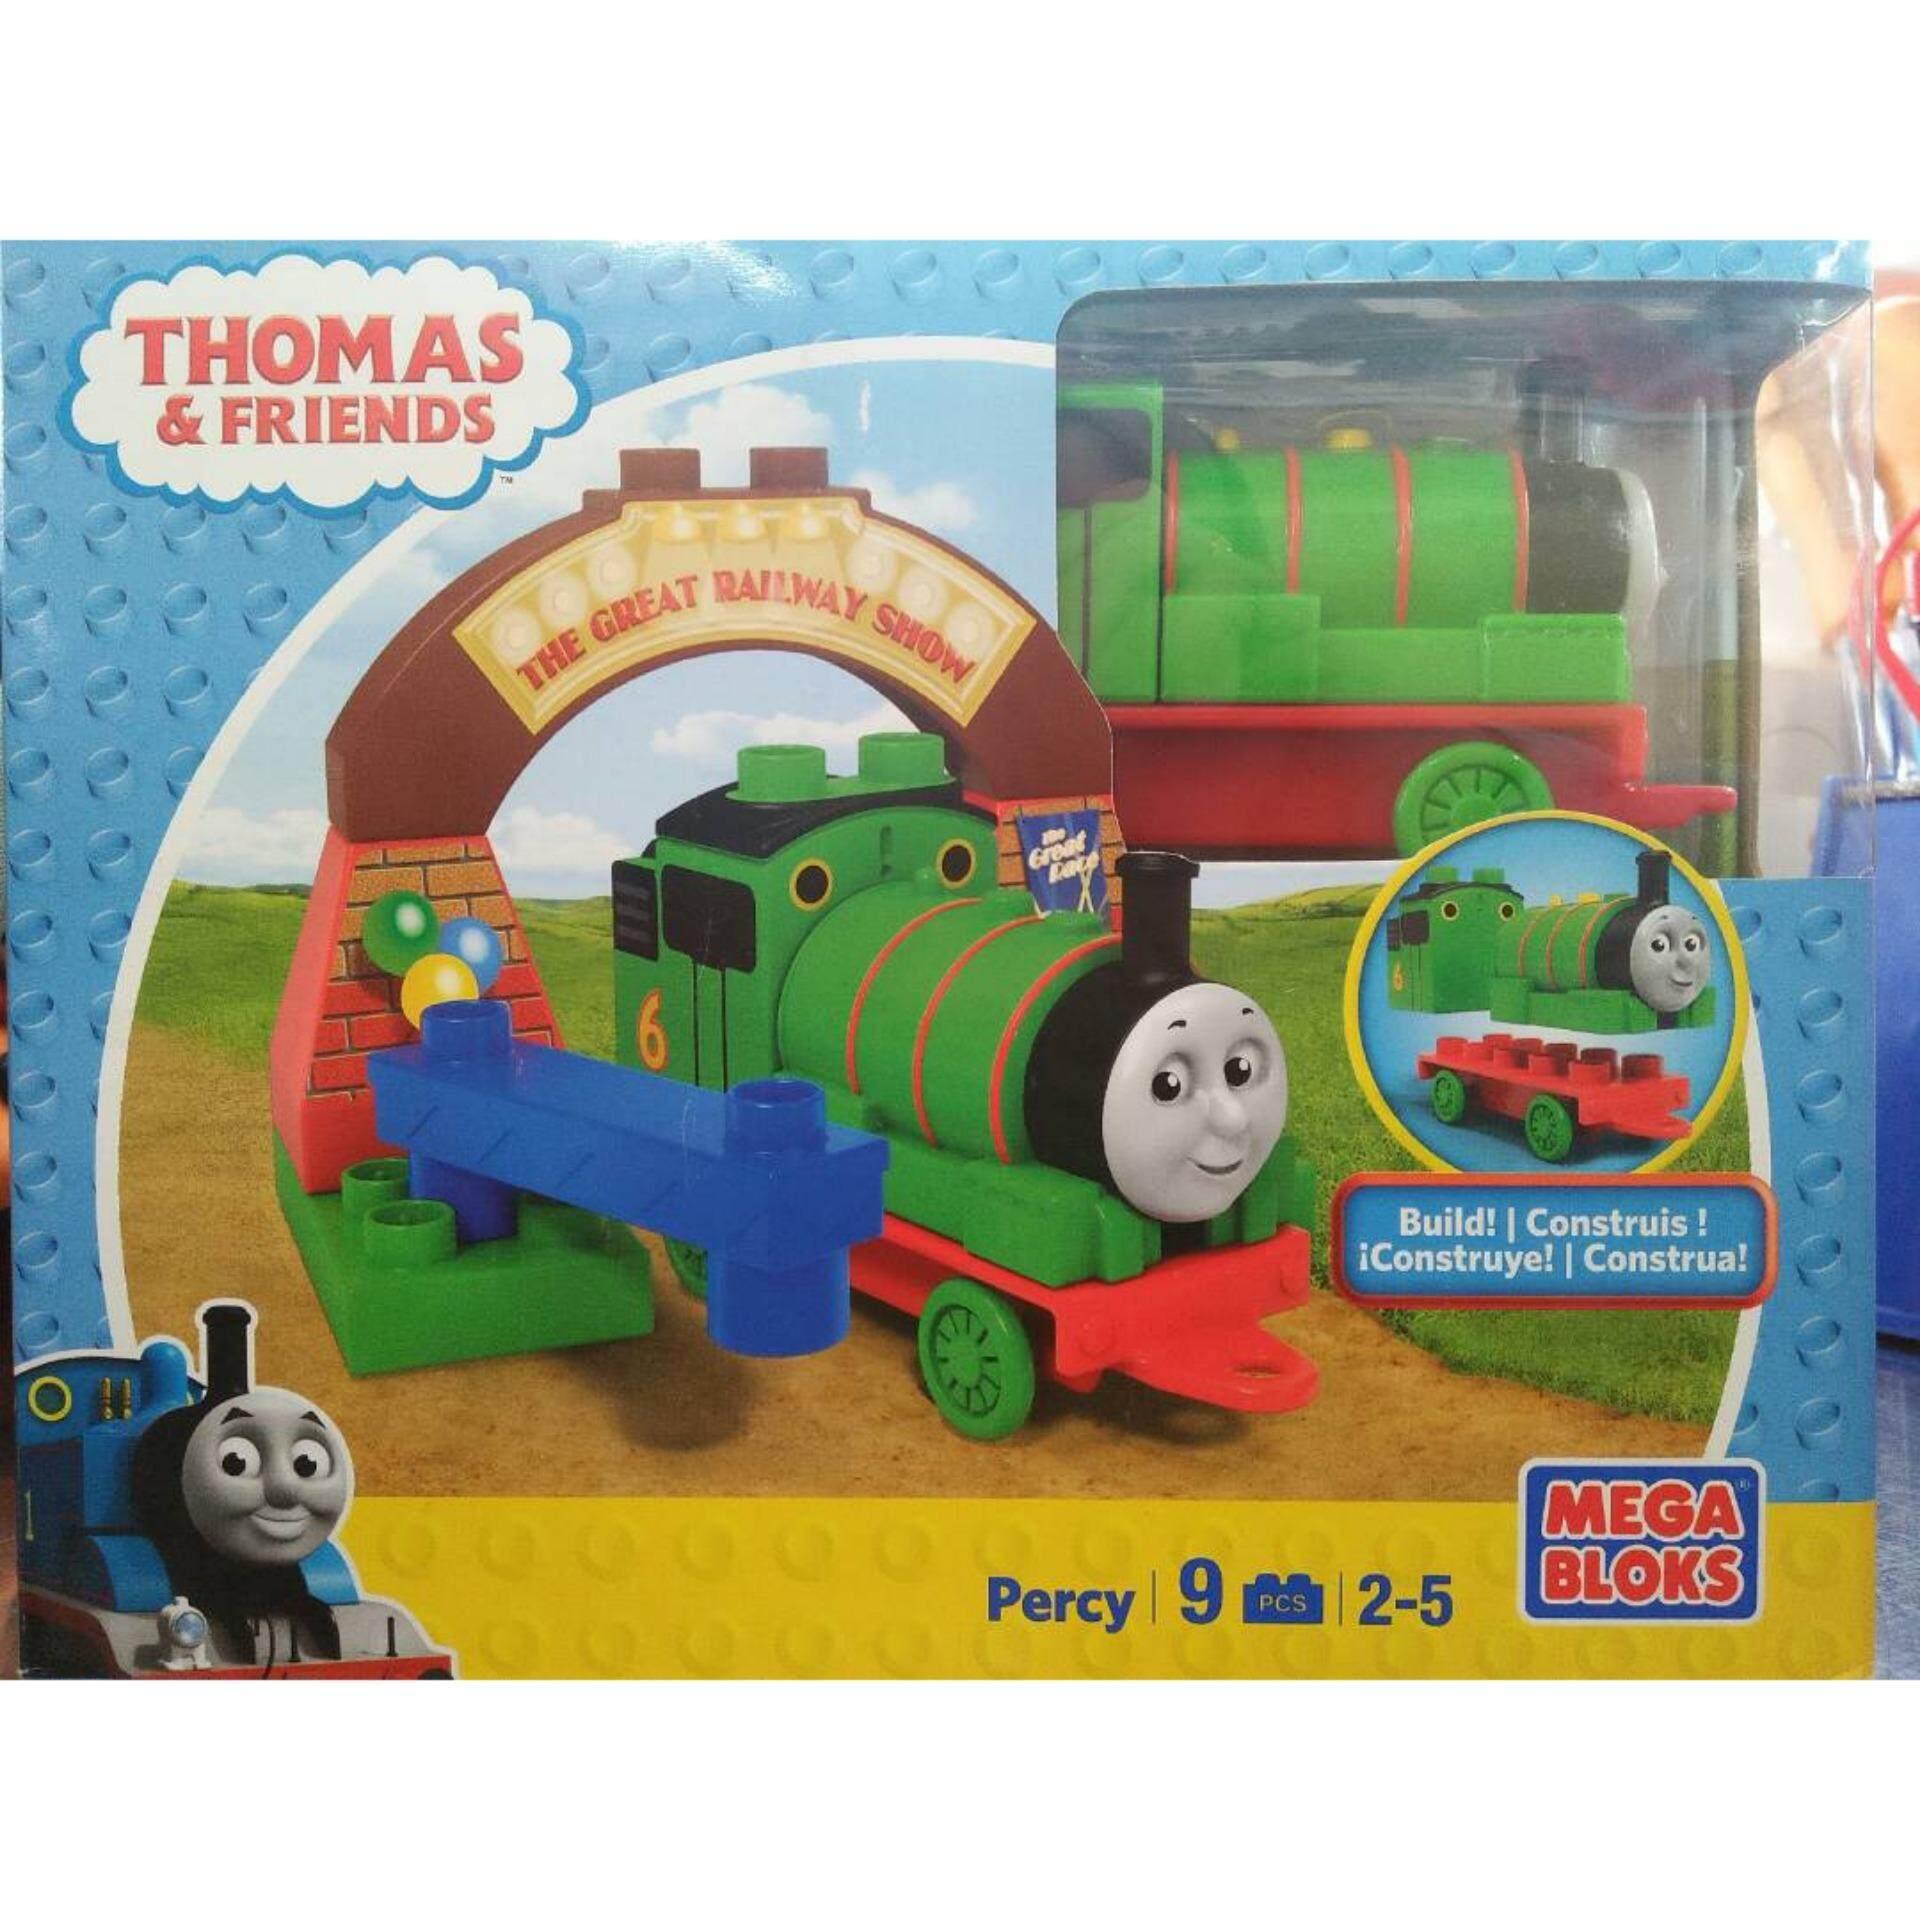 Thomas Friends Percy 9pcs Mega Blocks